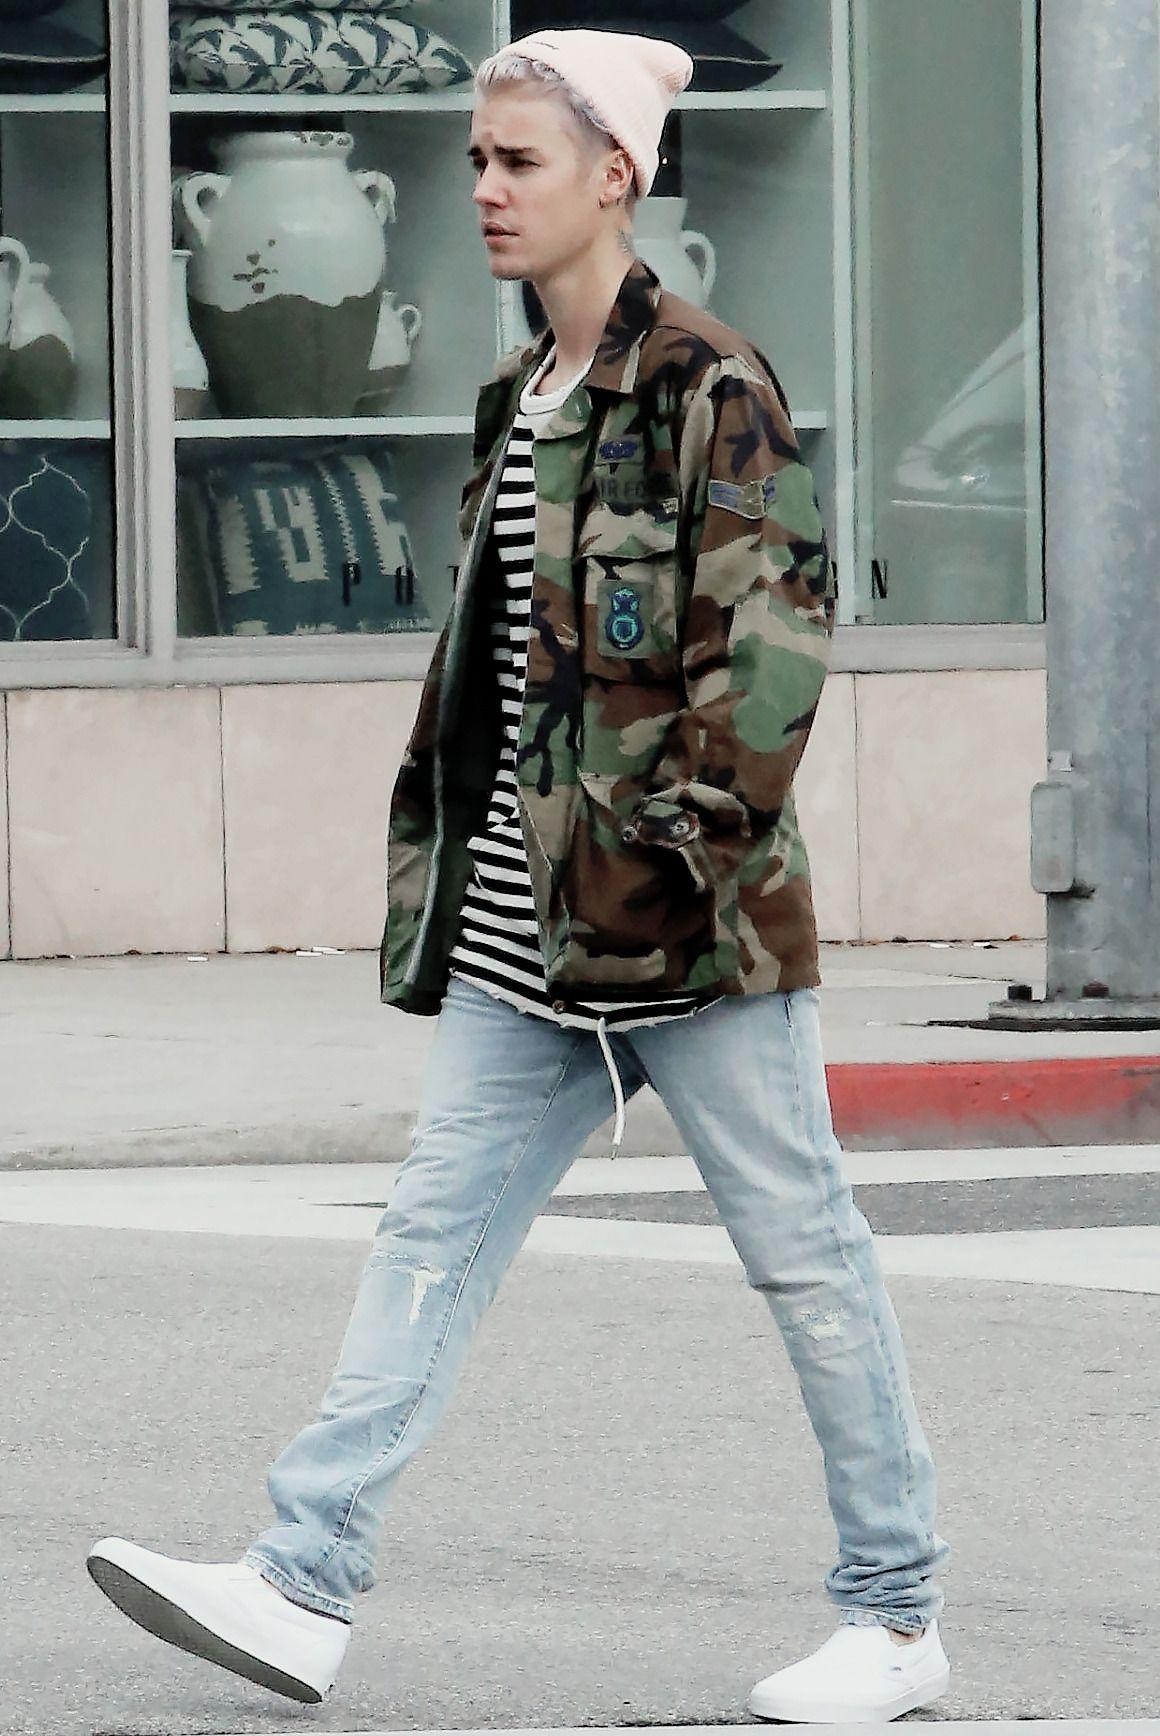 48e9ce468 ♕pinterest/amymckeown5 | Justin❤❤ Bieber | Justin bieber outfits ...